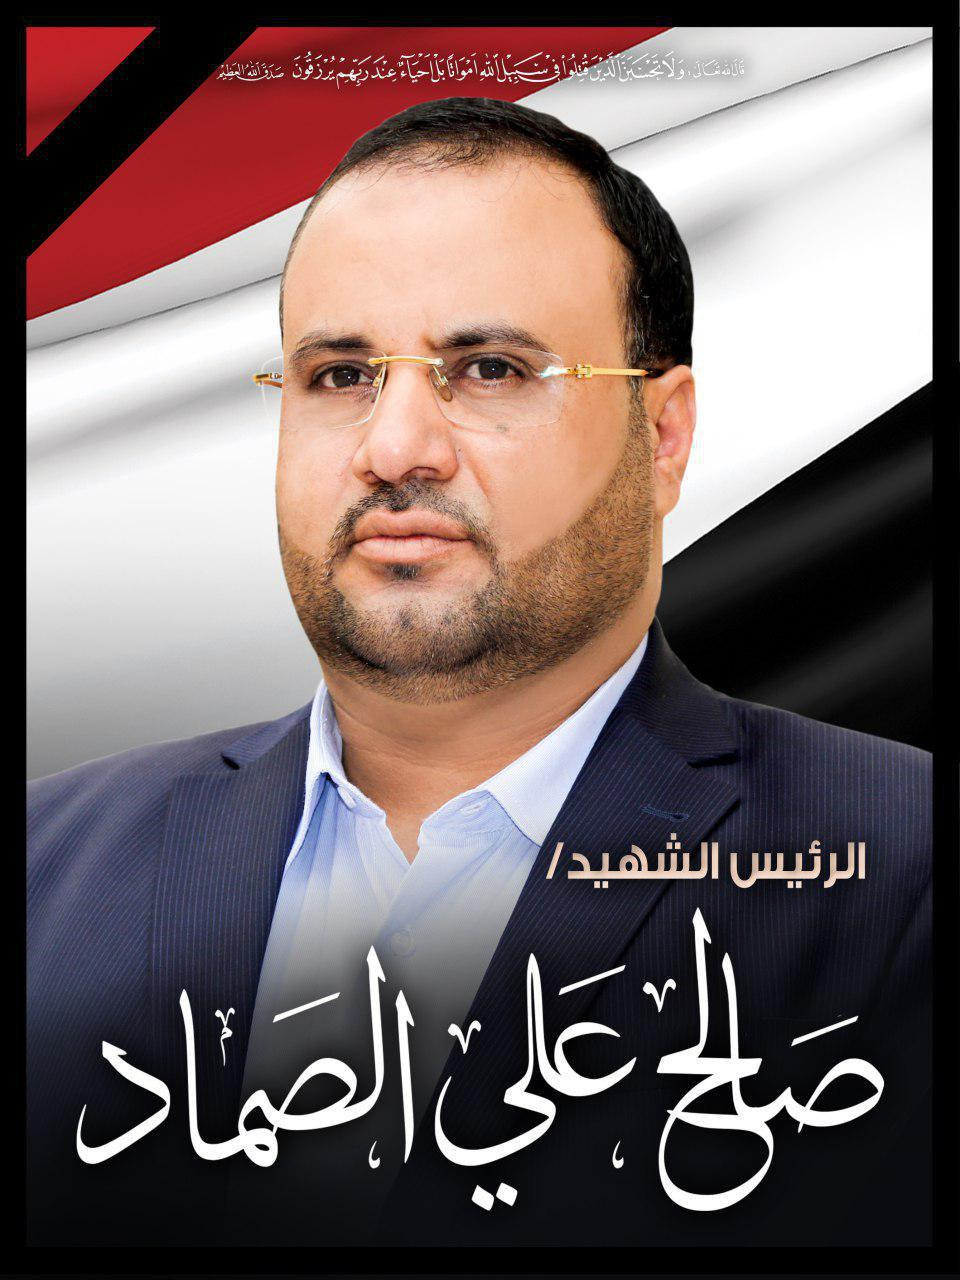 Image result for الشهيد صالح الصماد